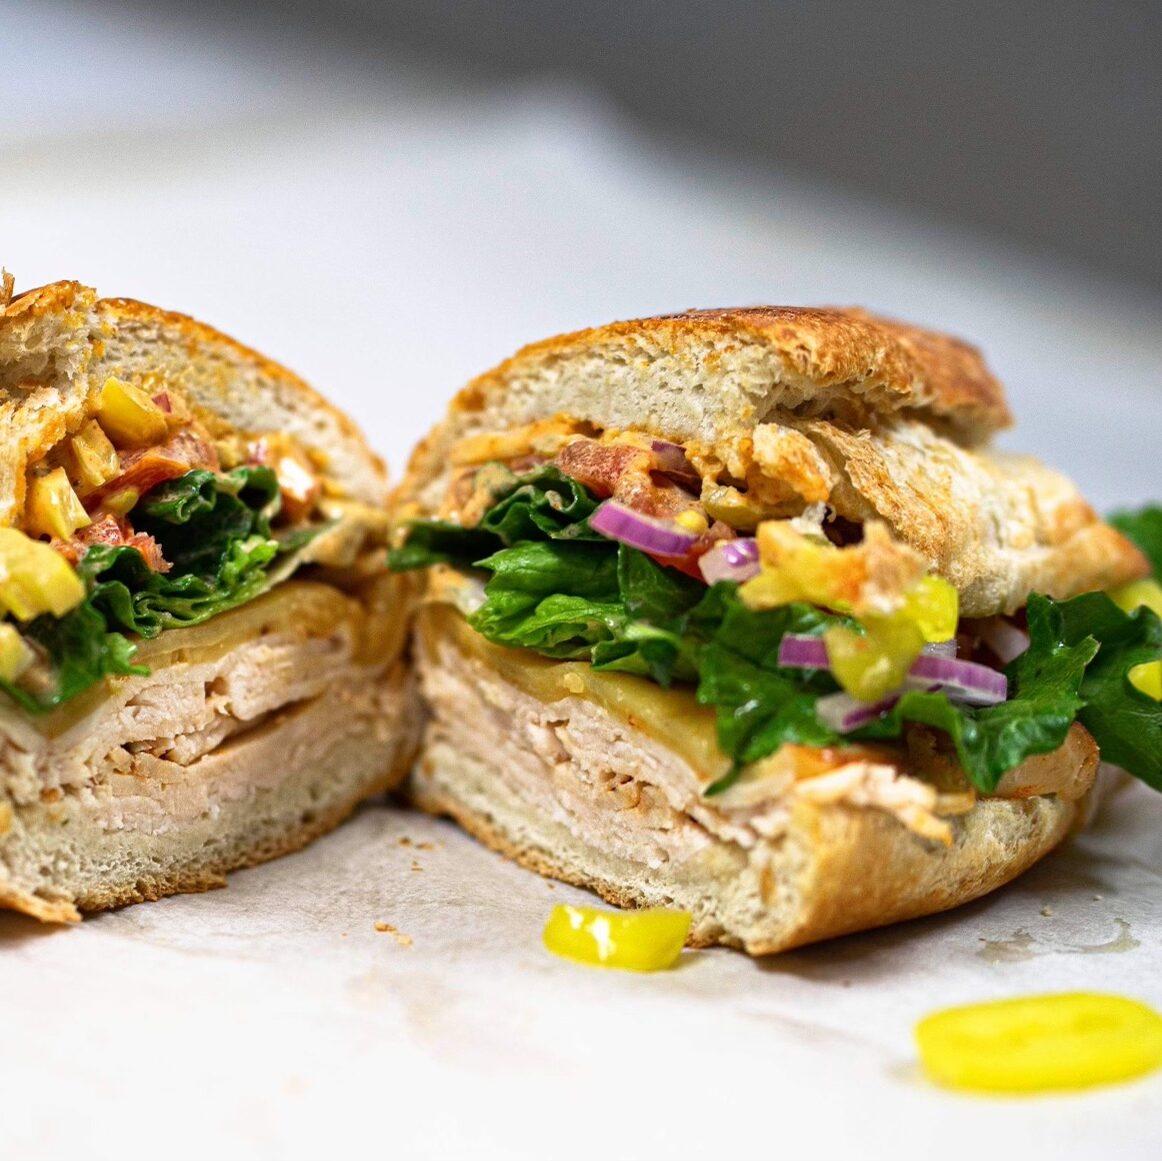 sandwich rocky mountain deli IMG 6868 e1624906713568